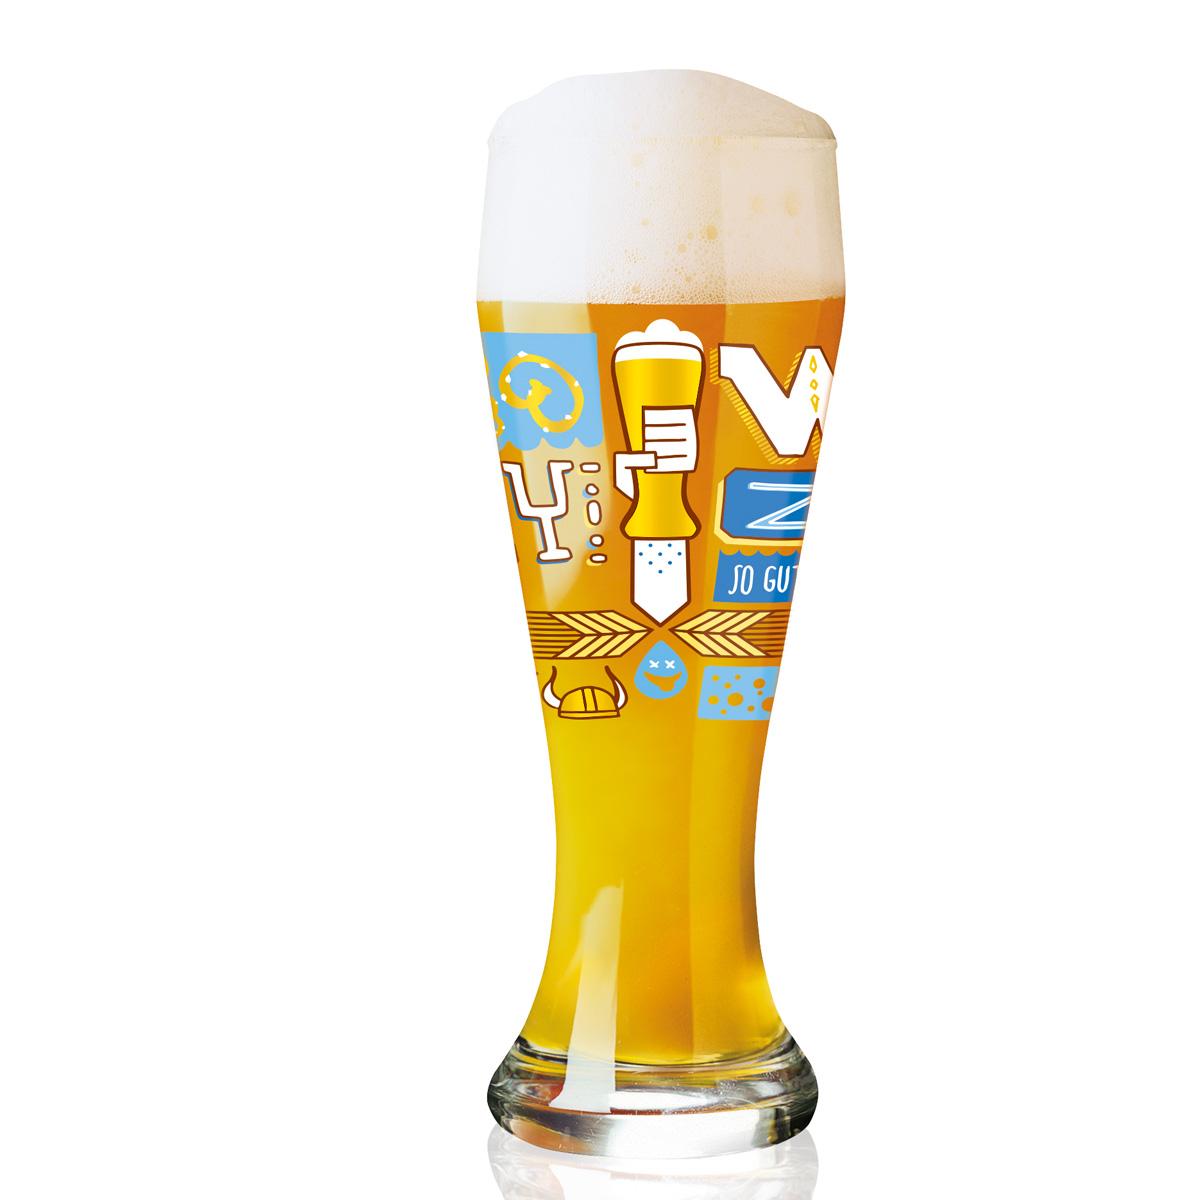 RITZENHOFF/リッツェンホフ WEIZEN BEER  COLLECTIONヴァイツェンビア・ビアタンブラー(Pietro Chiera -81020202)ピエトロ・キエラ デザイン ビアグラス ビールグラス ヴァイツェン 引出物 ブライダル・